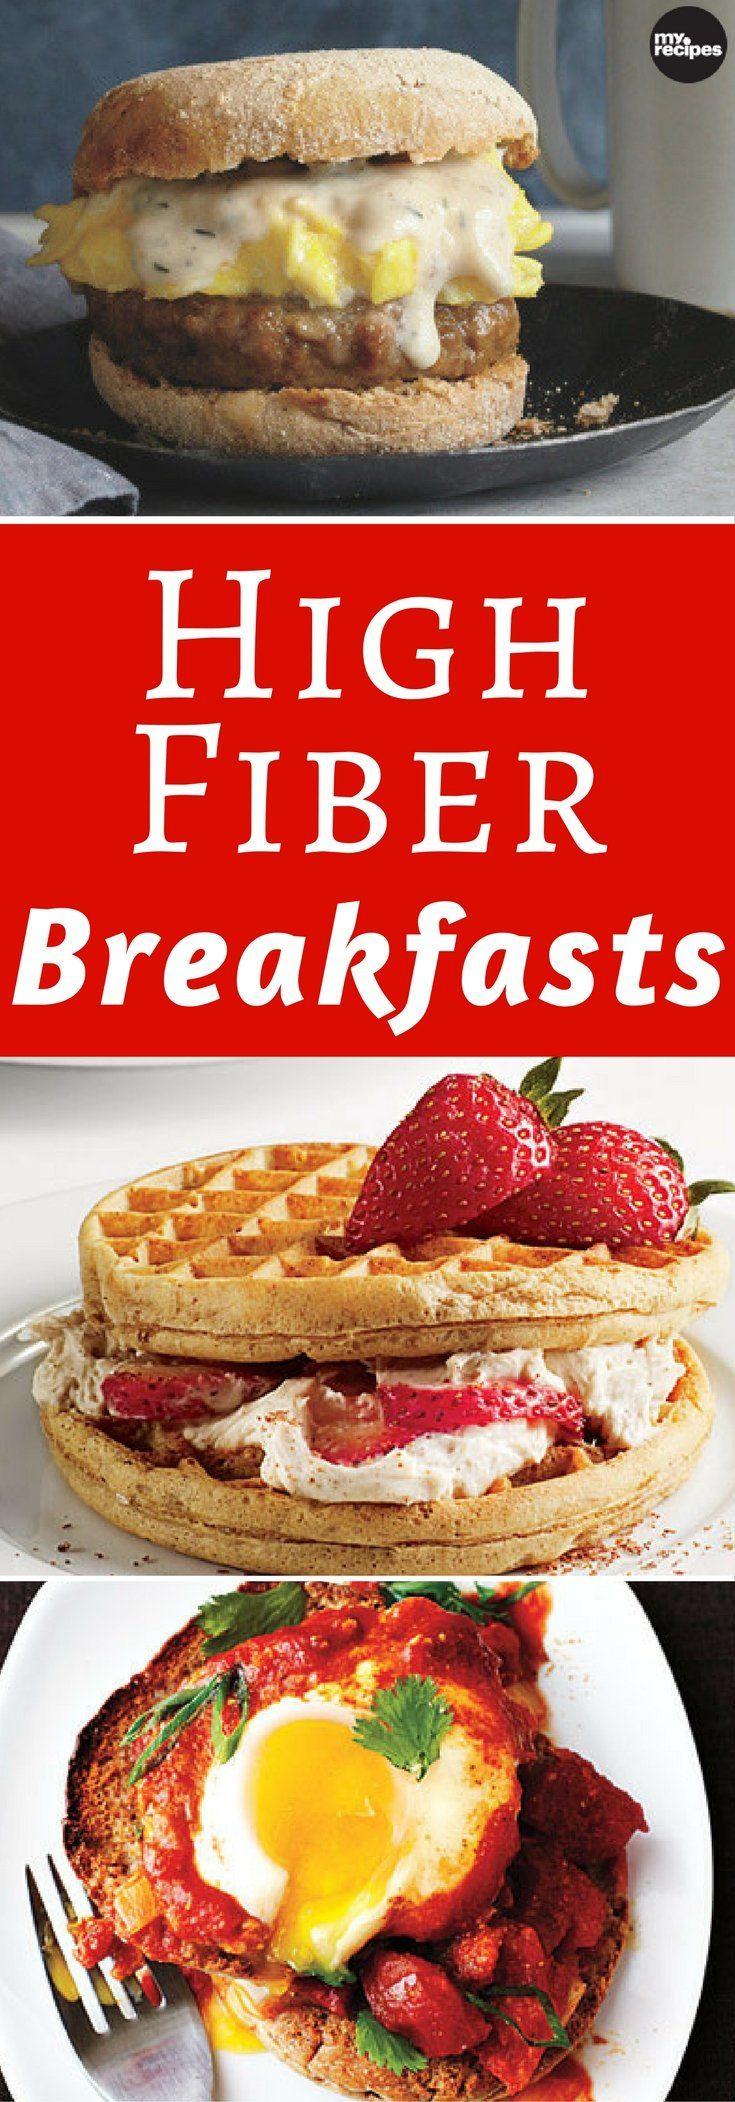 High Fiber Breakfast Recipes  366 best Breakfast and Brunch images on Pinterest